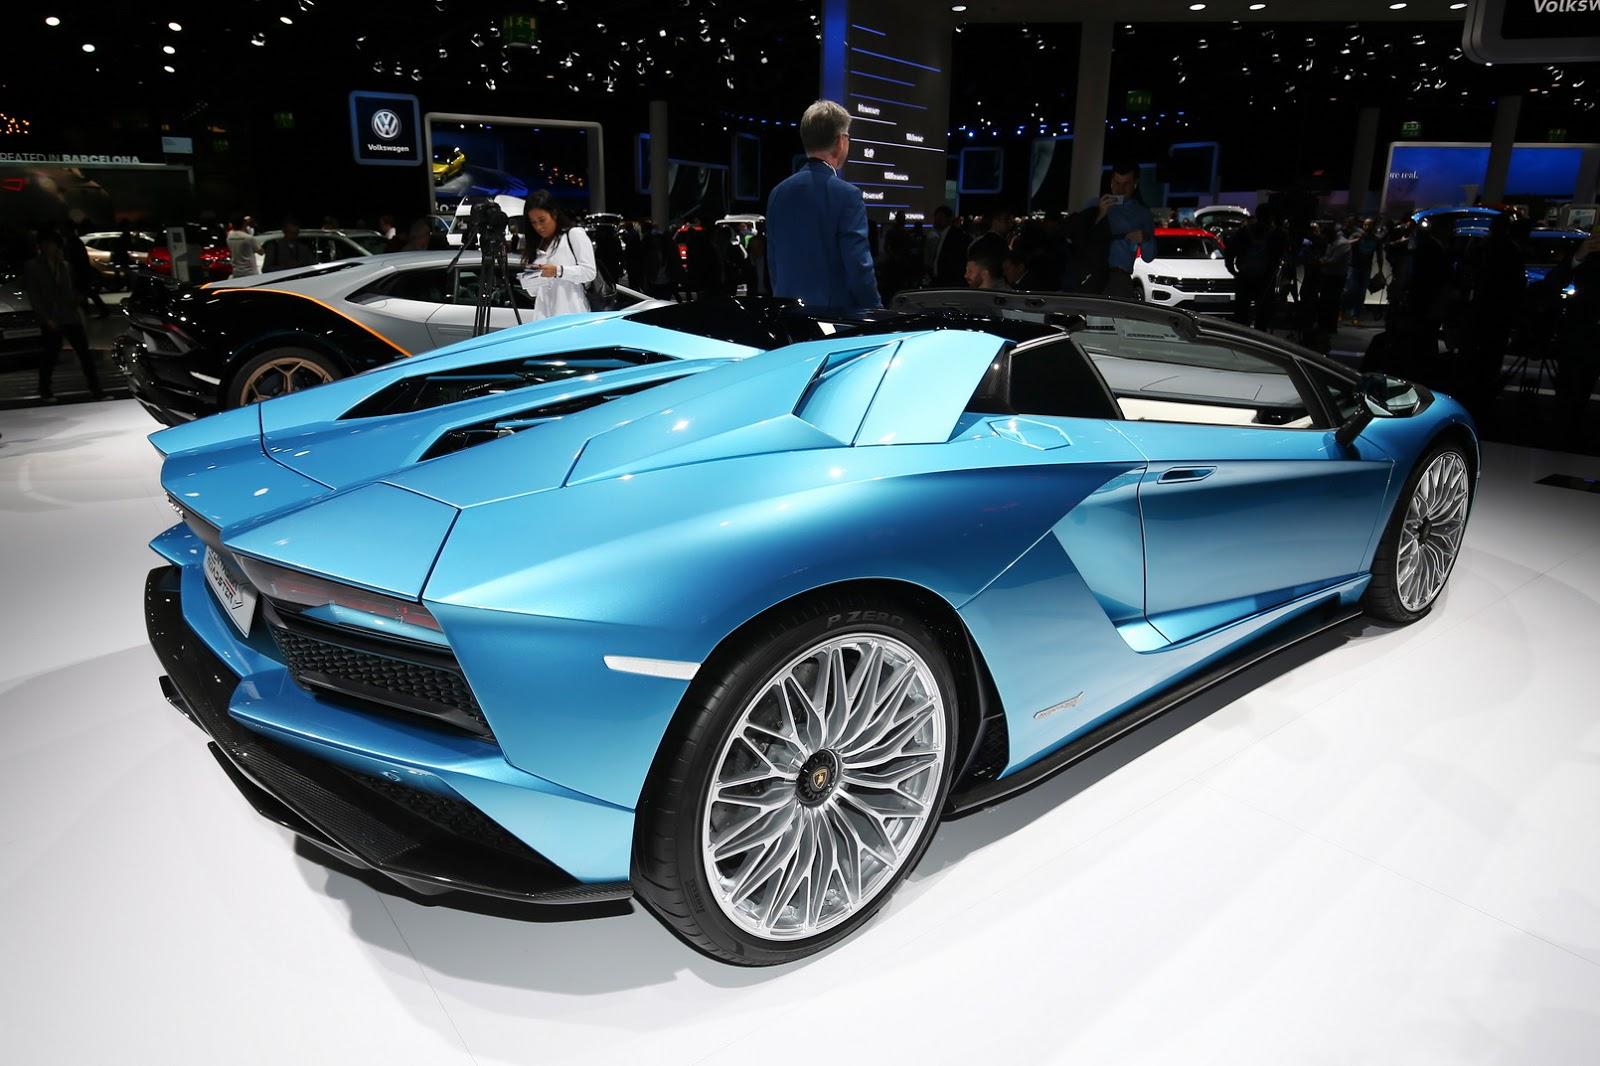 Lamborghini Aventador Roadster S facelift (19)